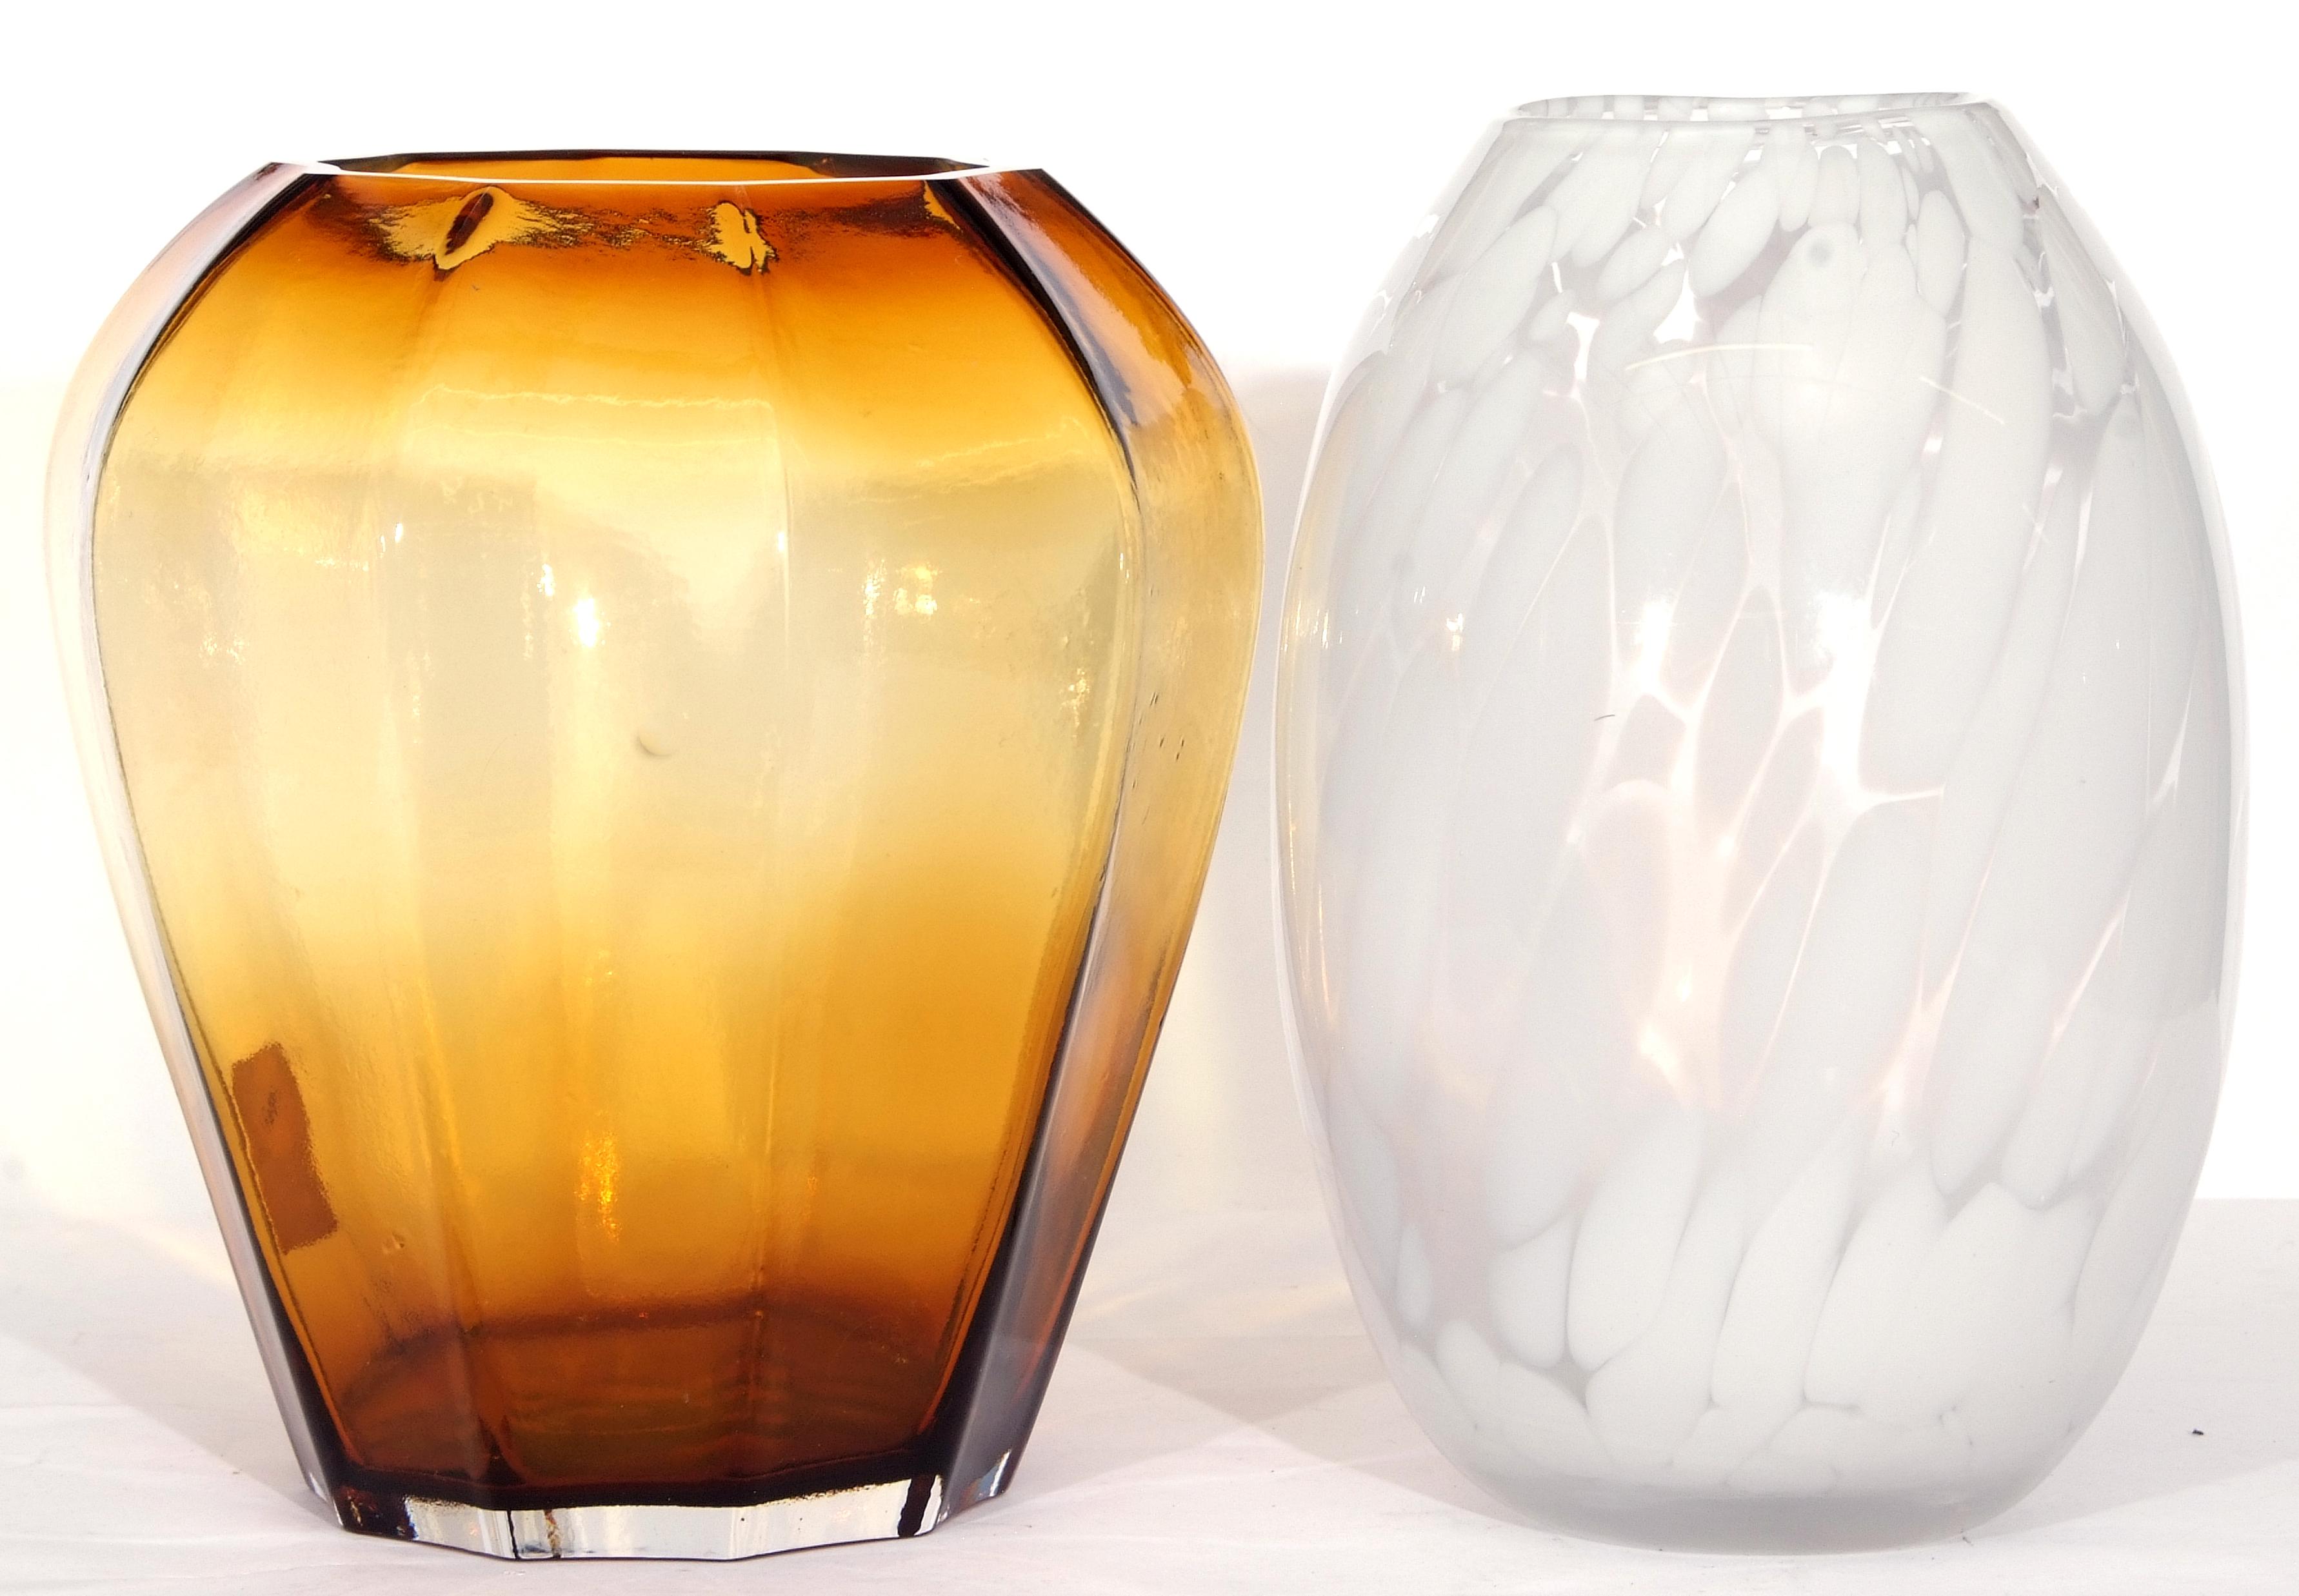 Orrefors globular vase with a streaked white design and further shaped vase (2)